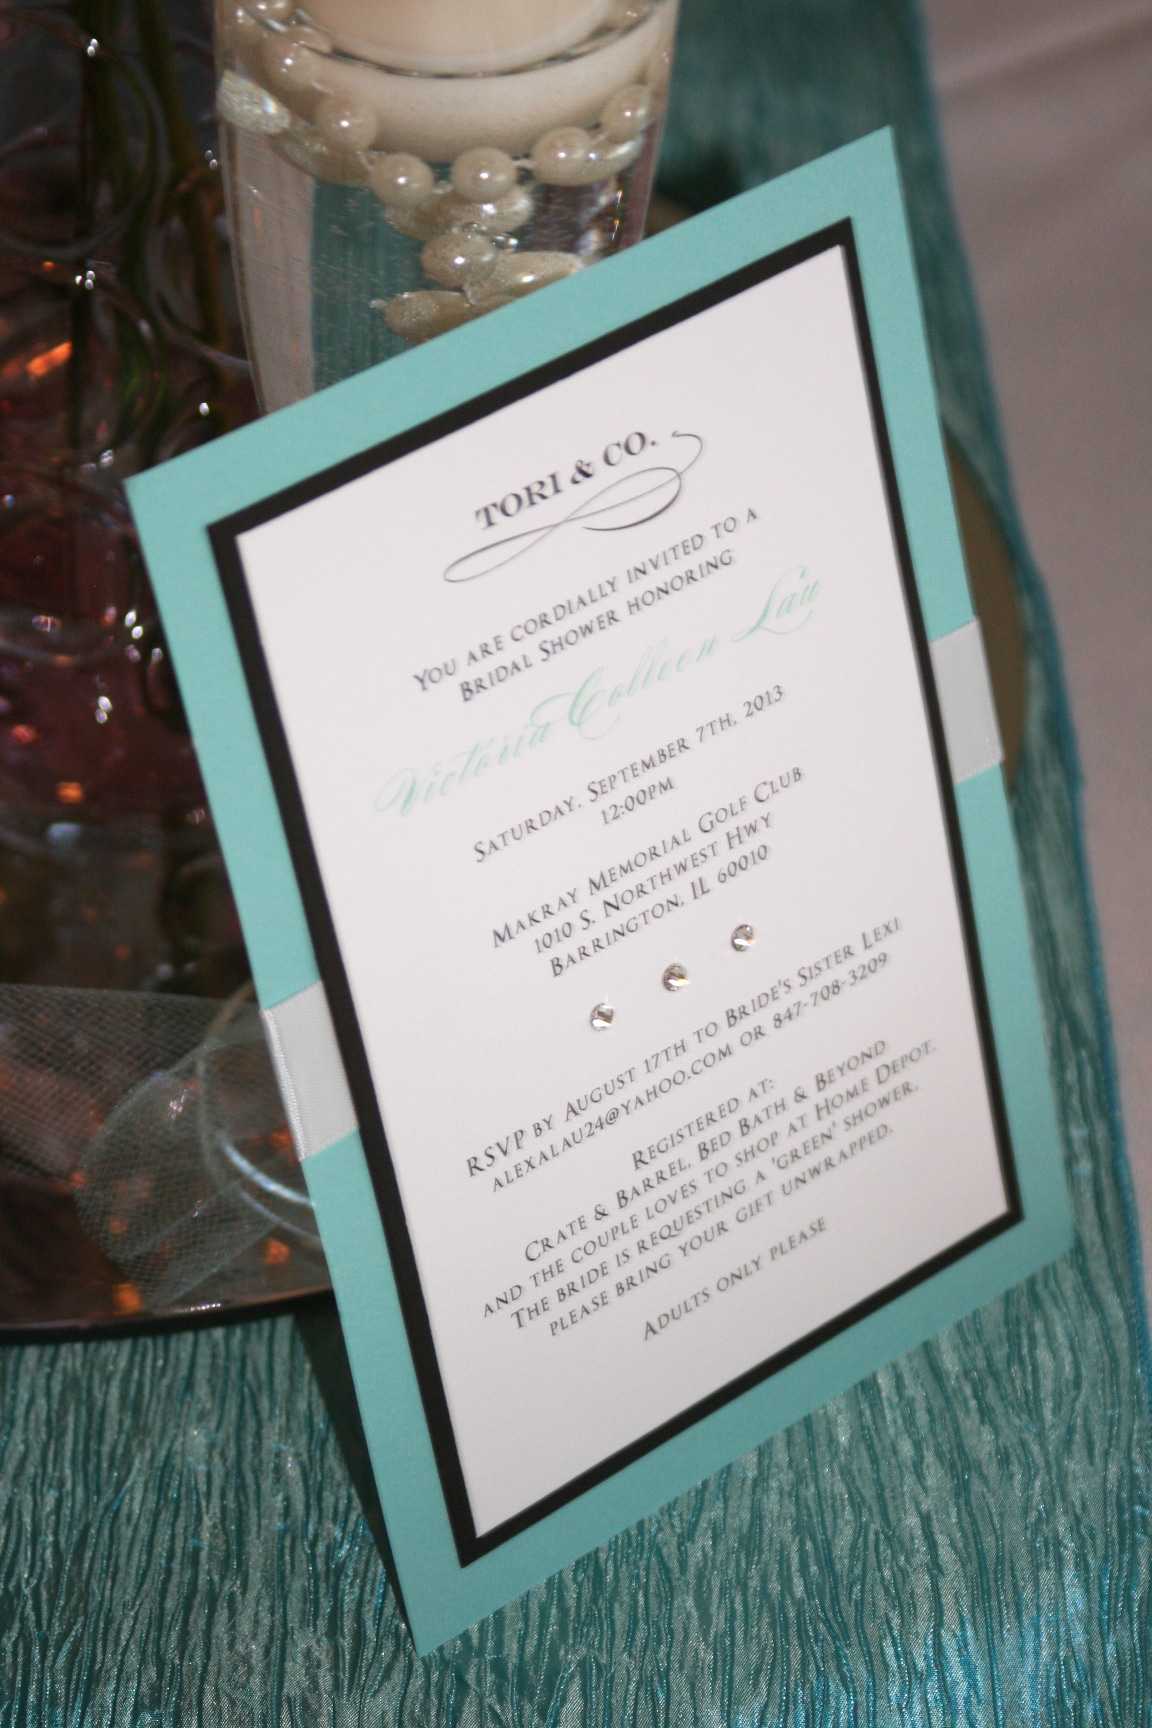 Tiffany Themed Bridal Shower Invitations - Too Chic & Little Shab ...